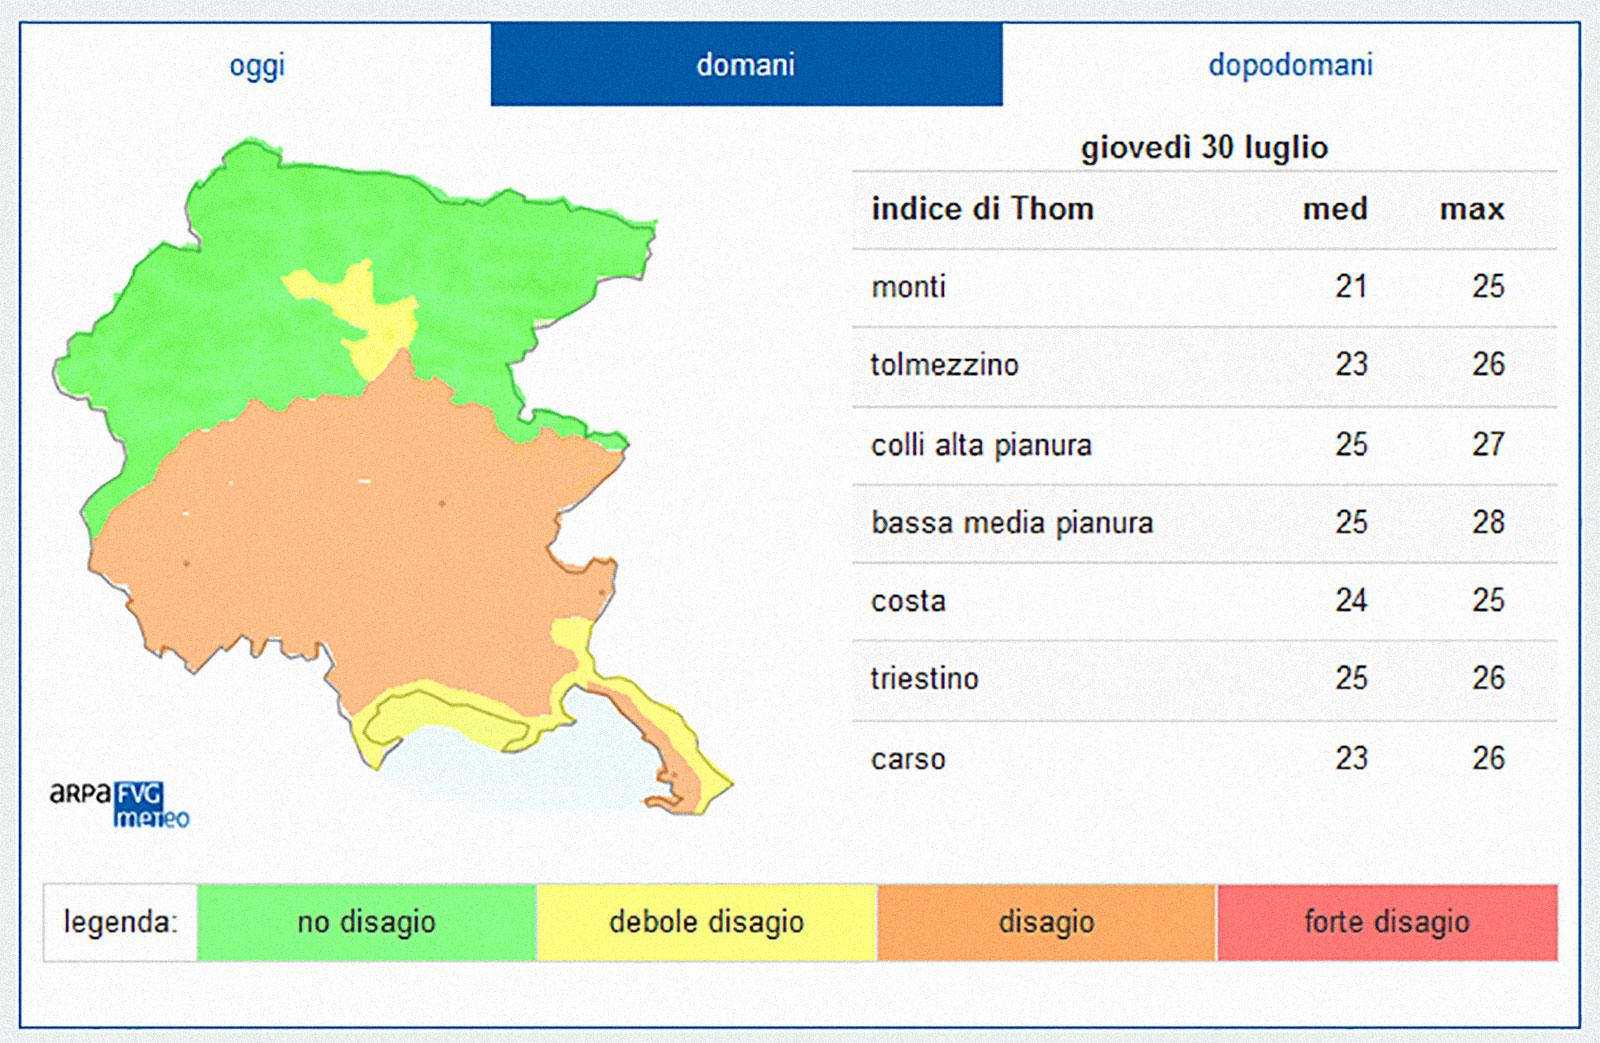 mappa del disagio